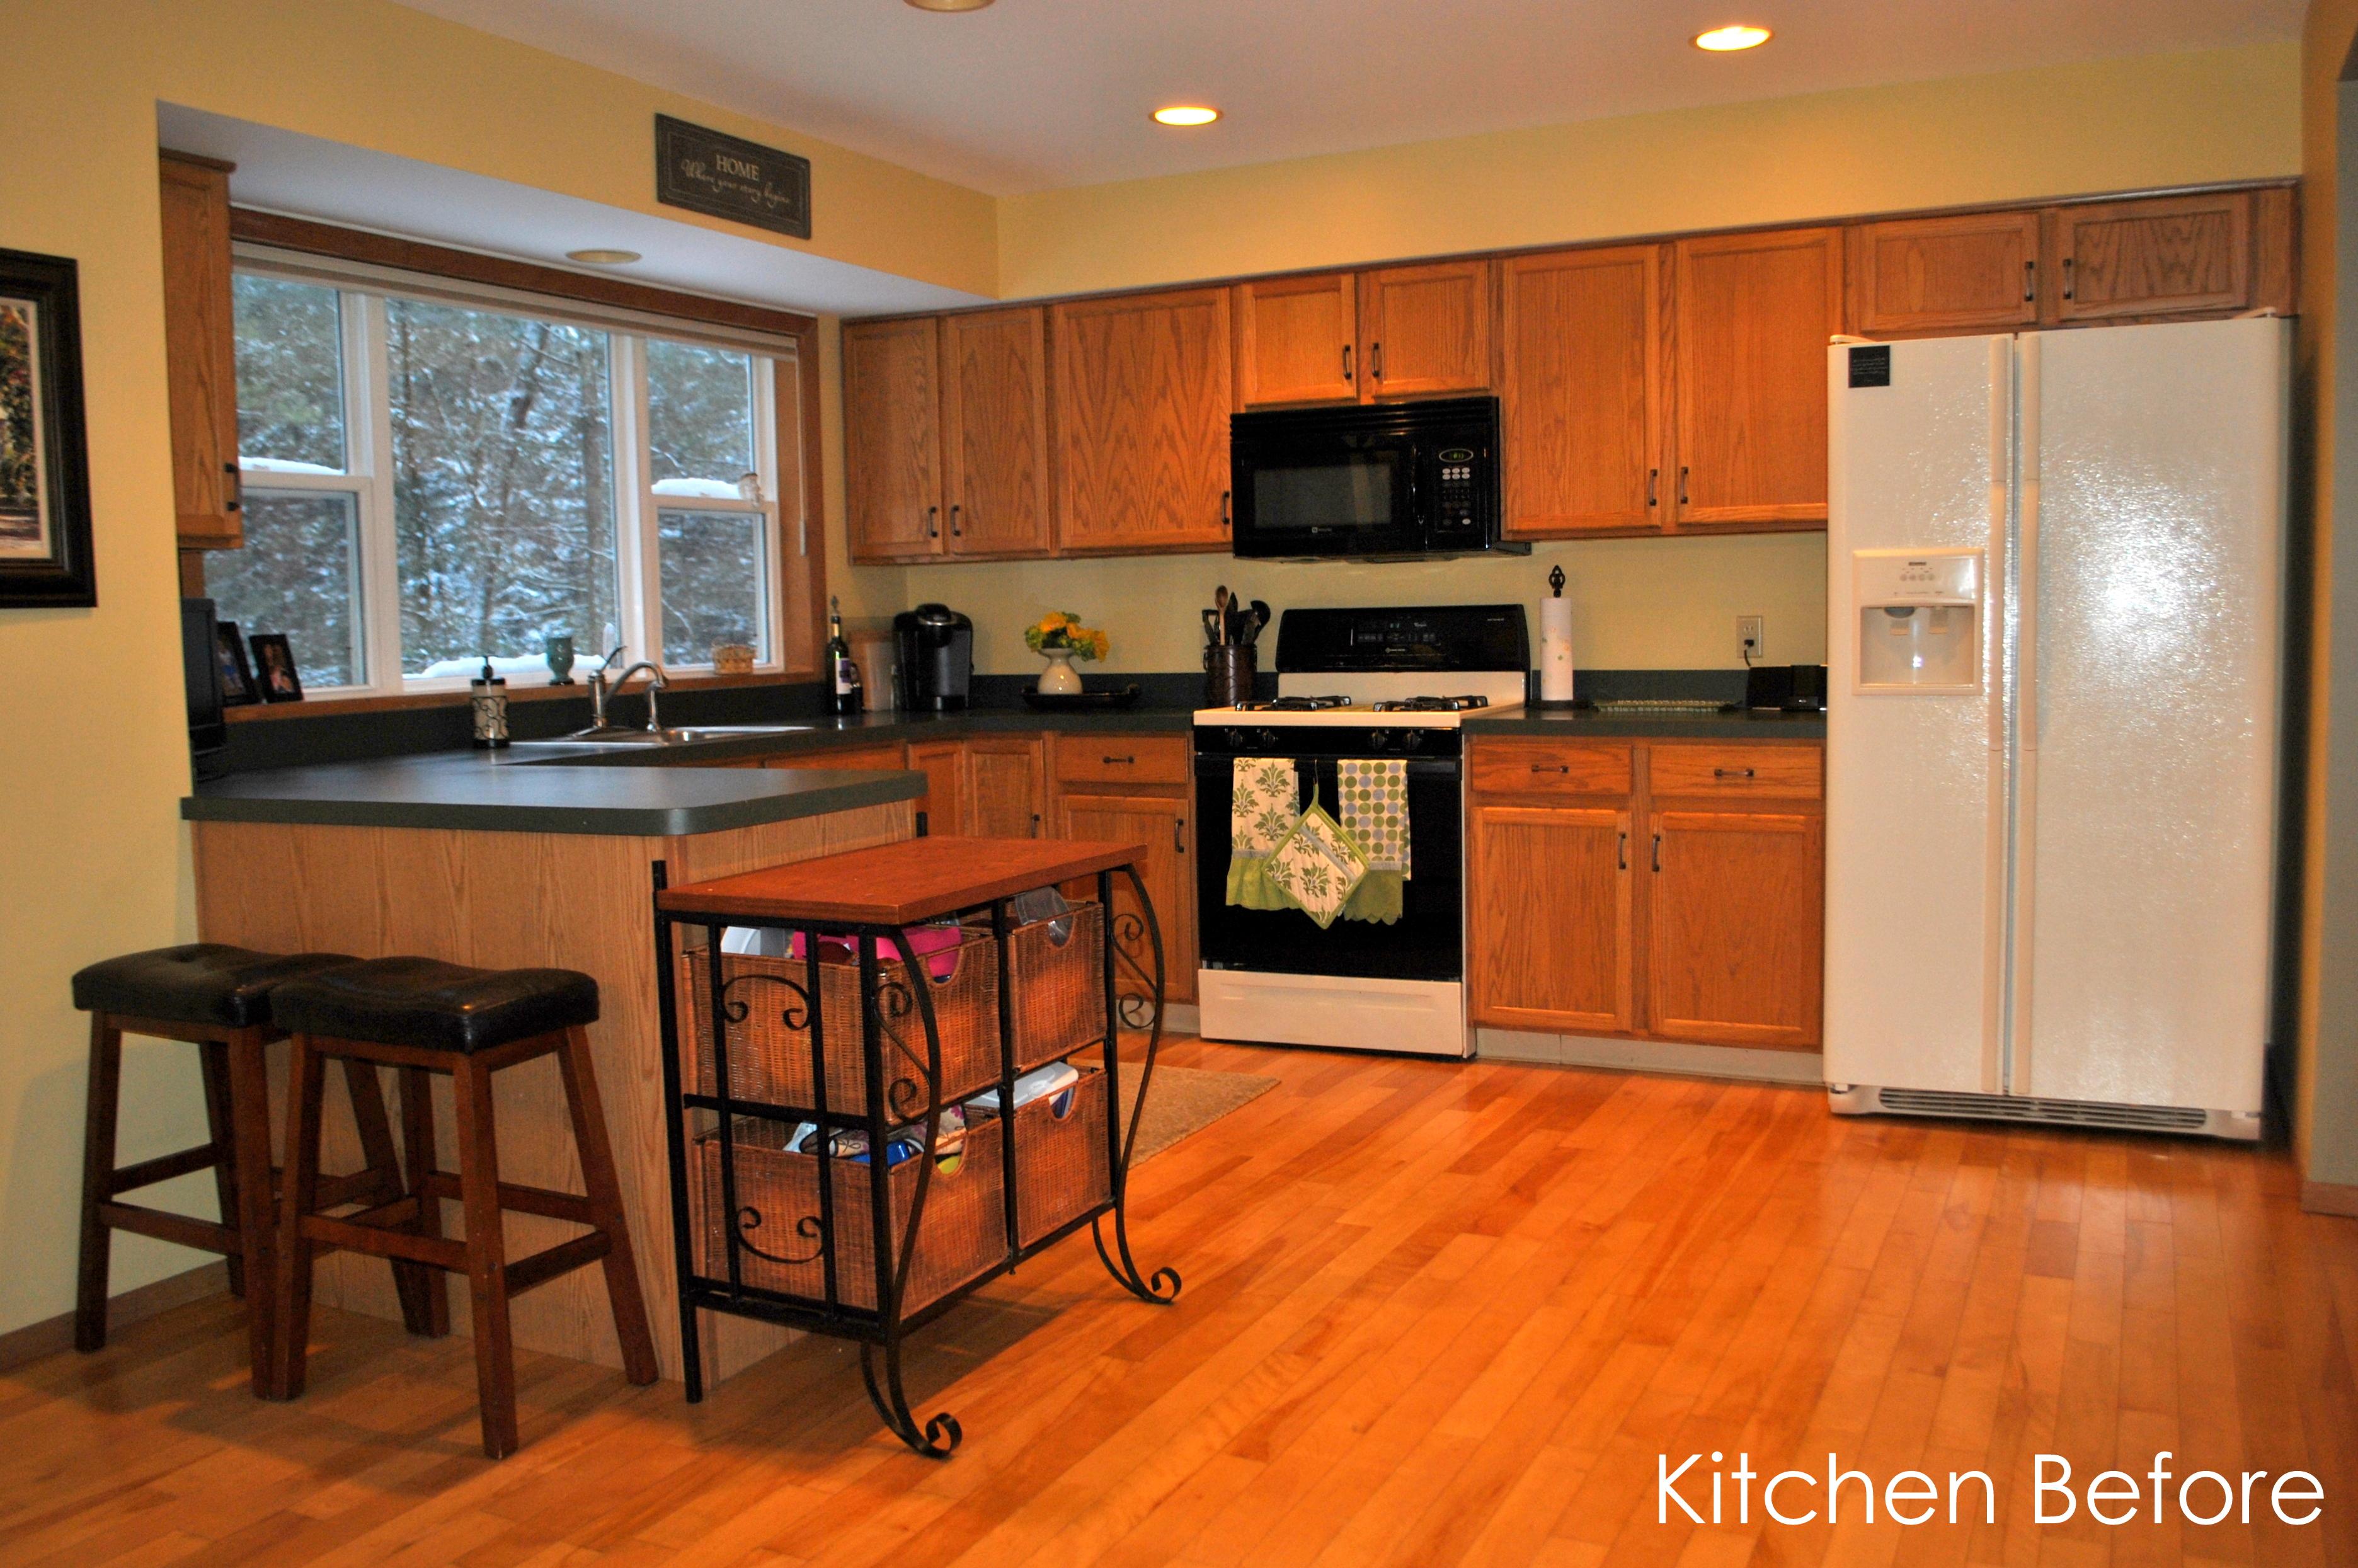 Rustoleum kitchen countertop paint Photo - 3